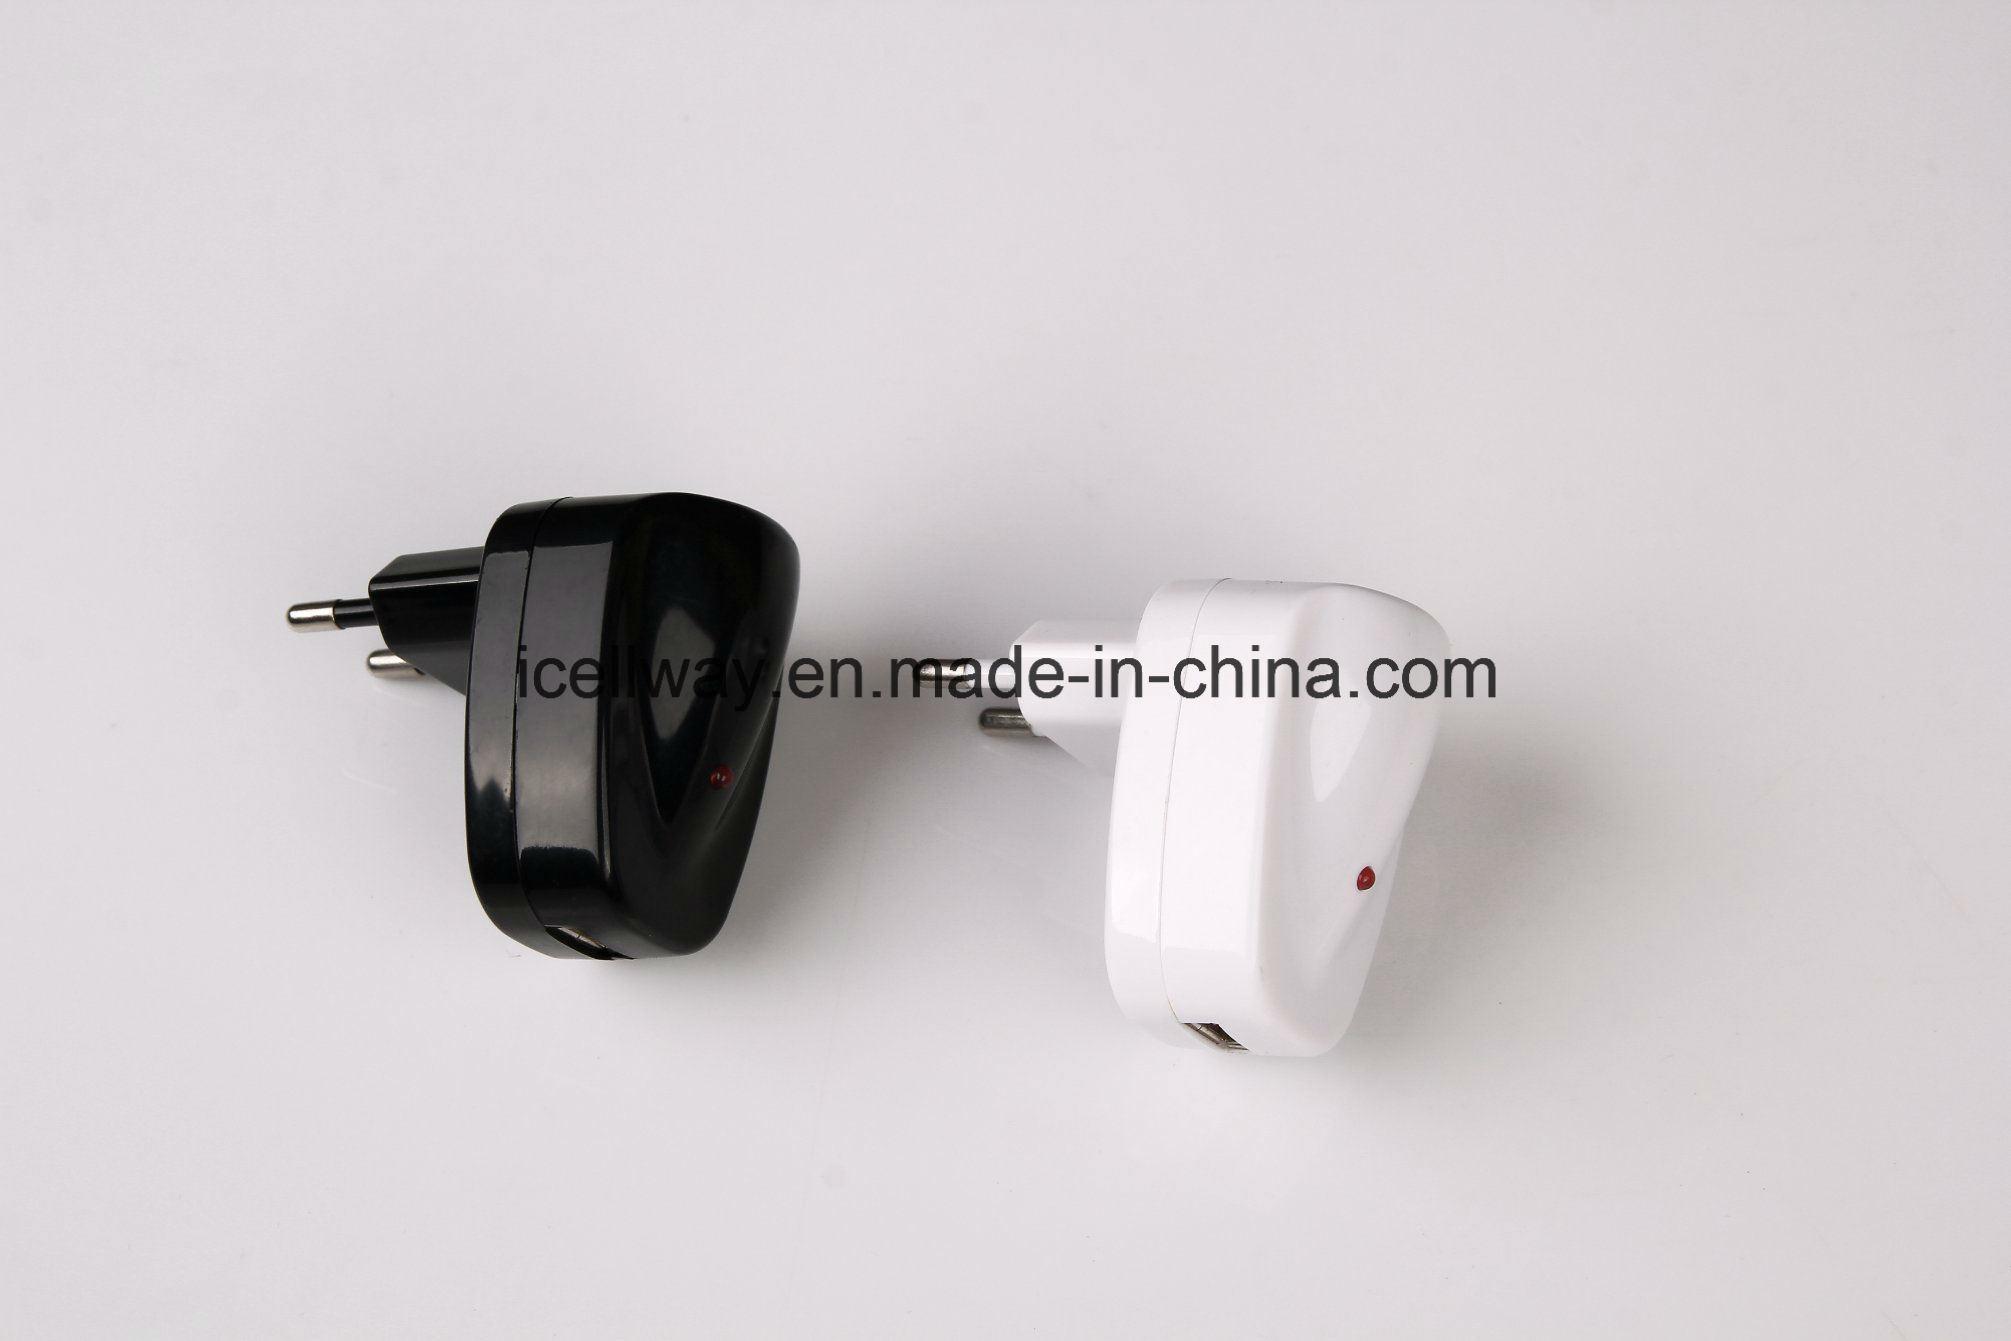 Fashion 5V 1A Universal Portable USB Travel Charger